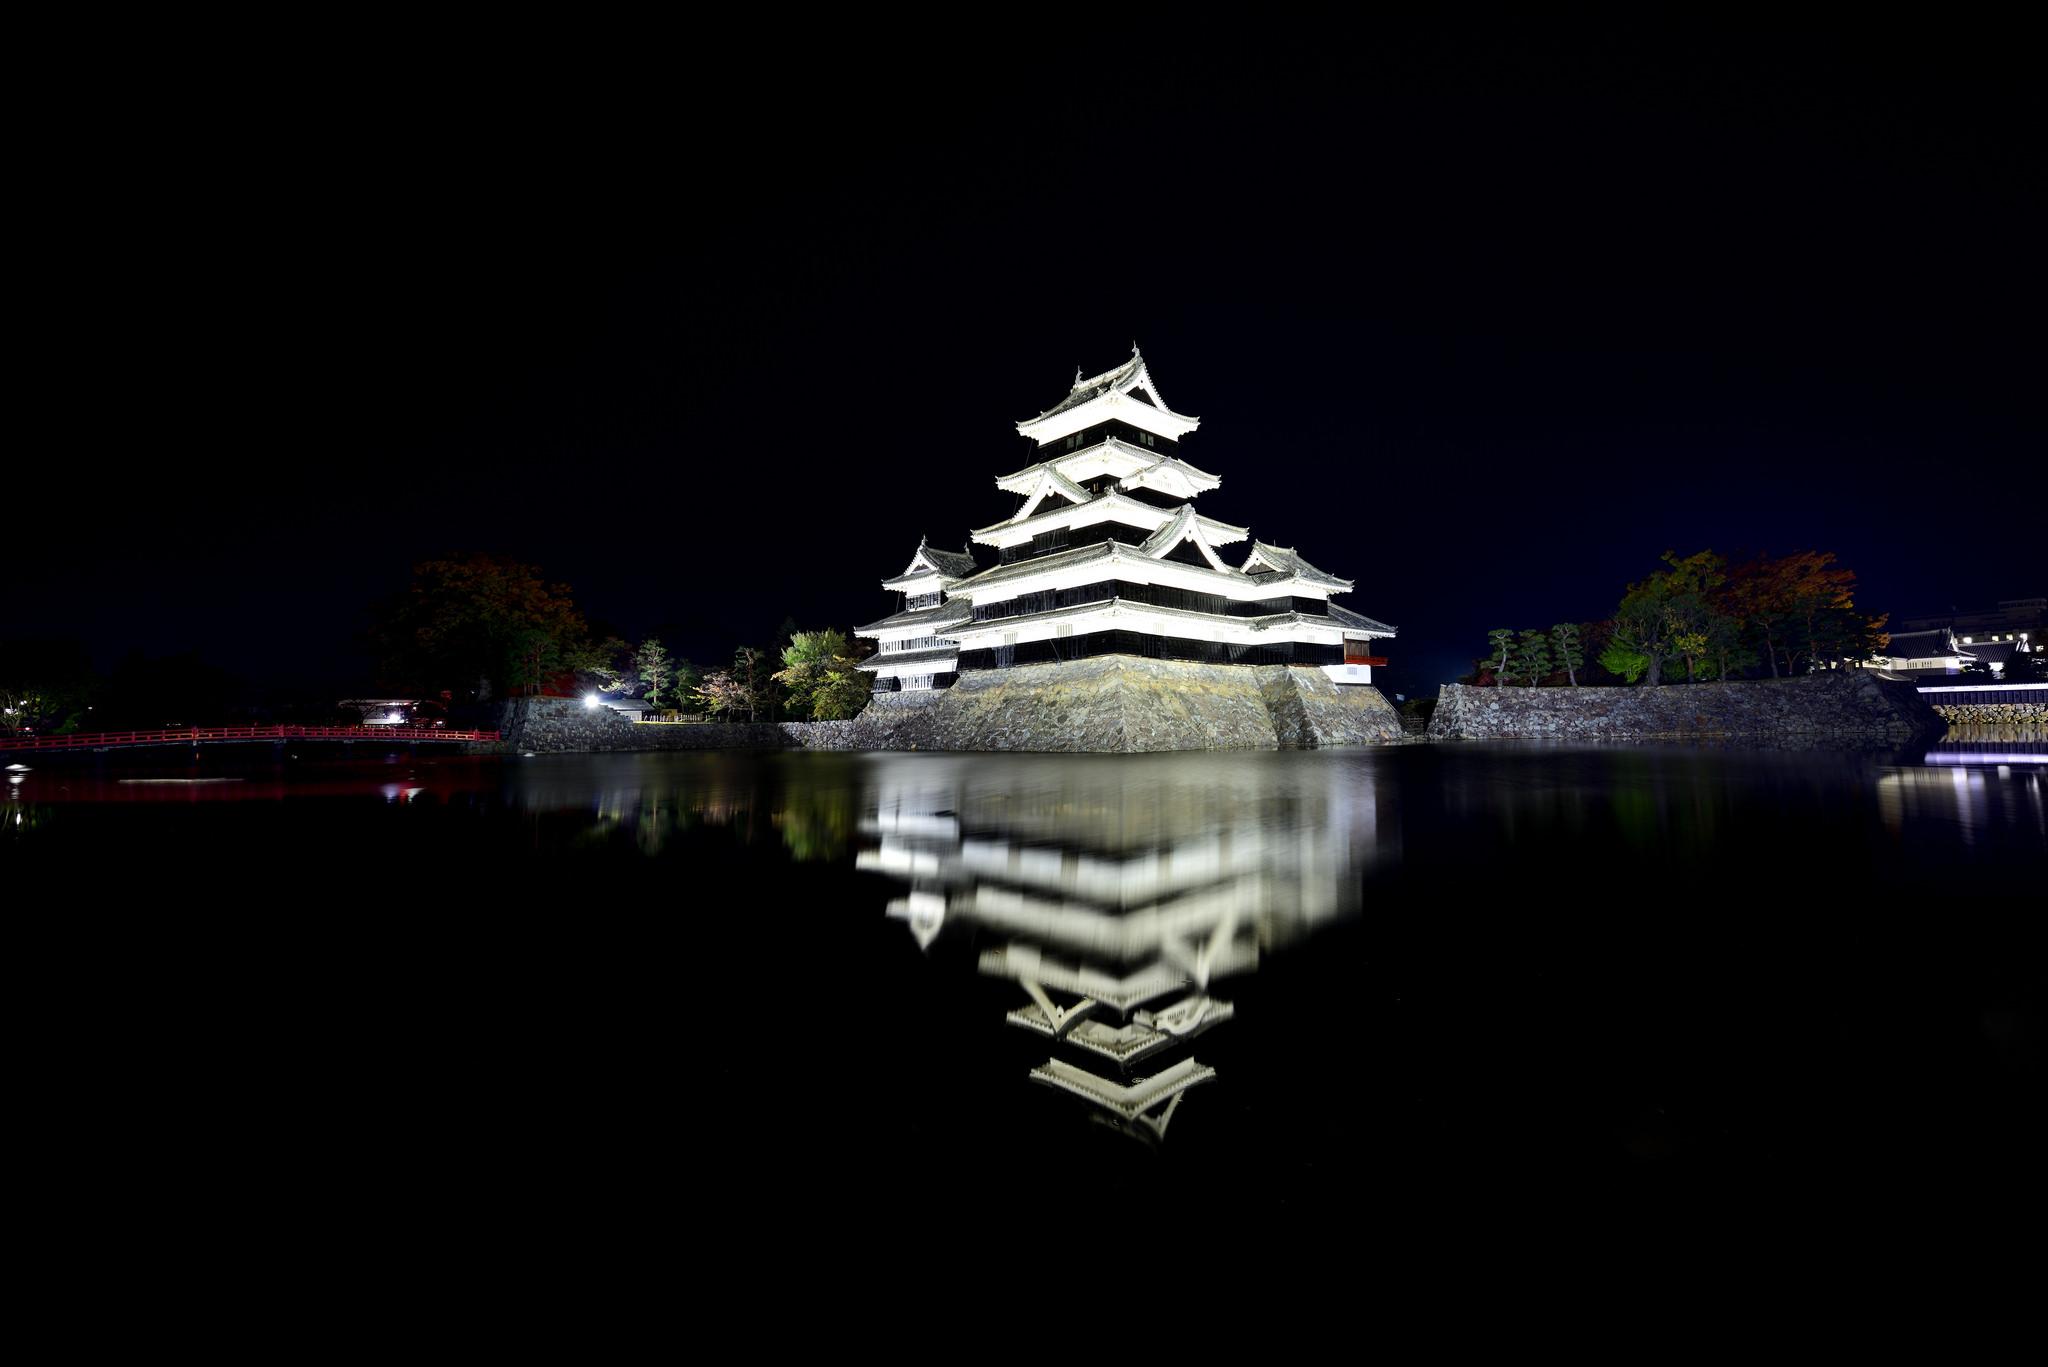 Matsumoto Castle Hd Wallpaper Background Image 2048x1367 Id